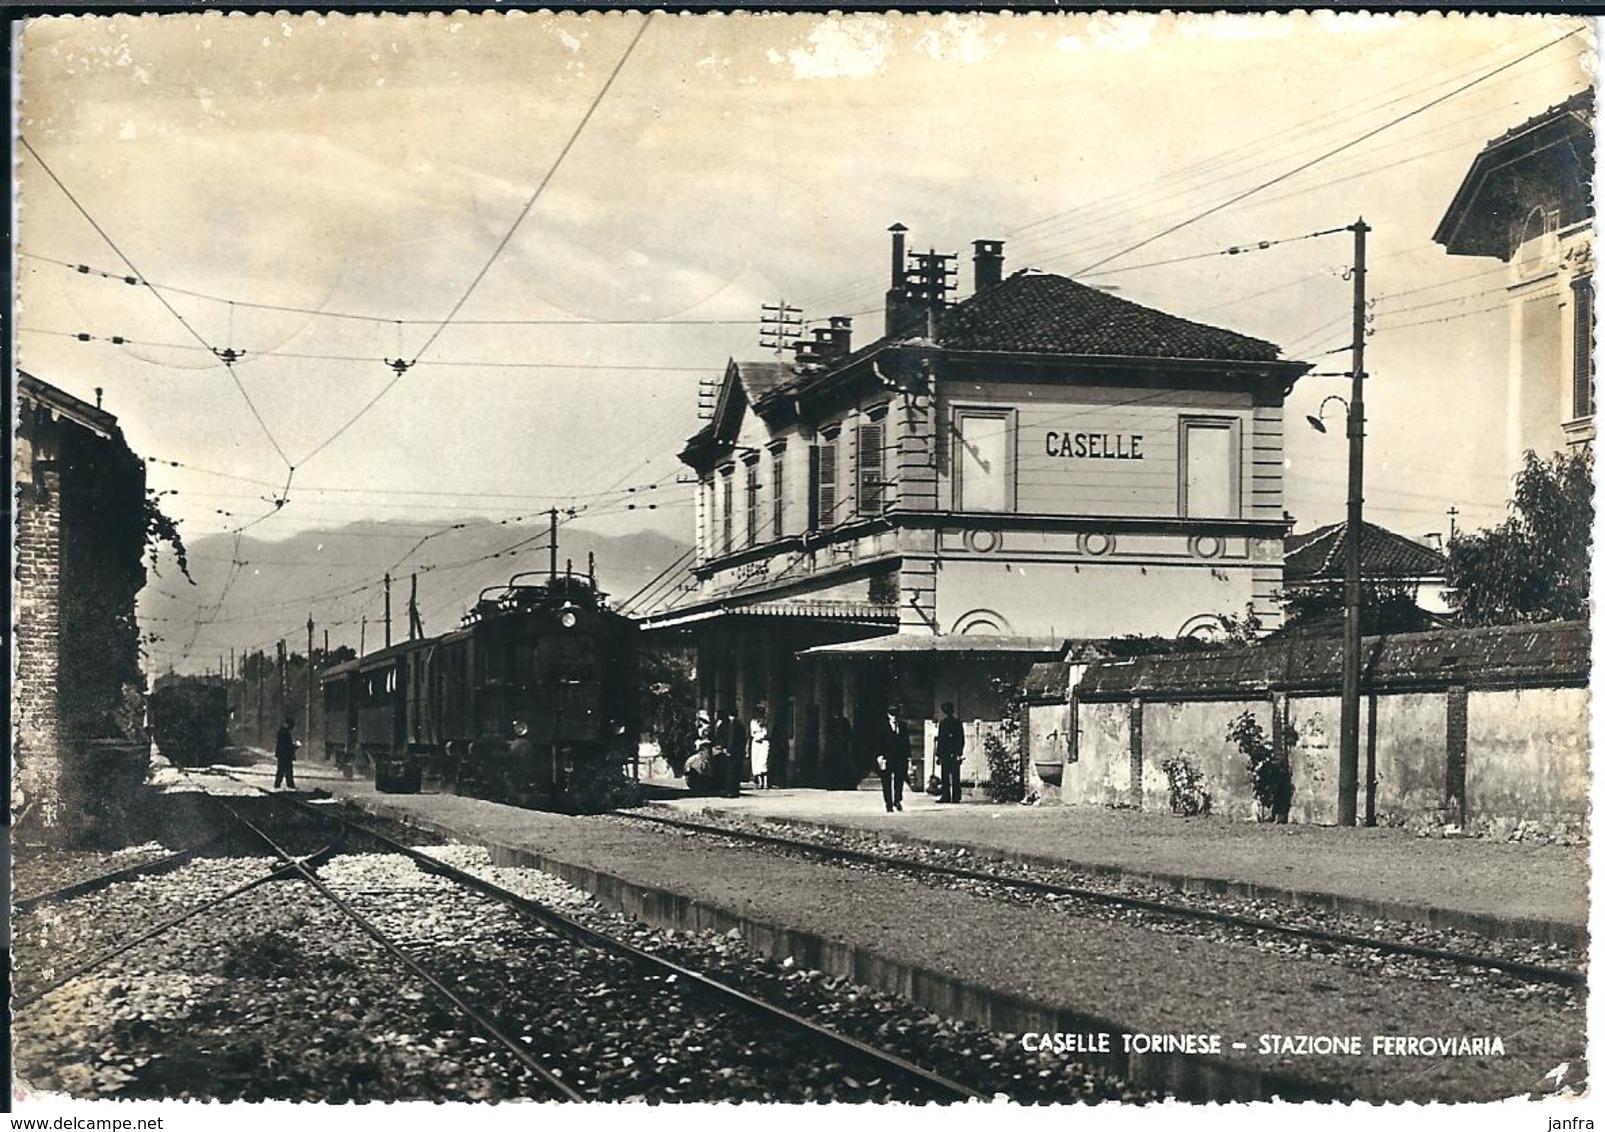 CASELLE TORINESE - STAZIONE FERROVIARIA - Trasporti